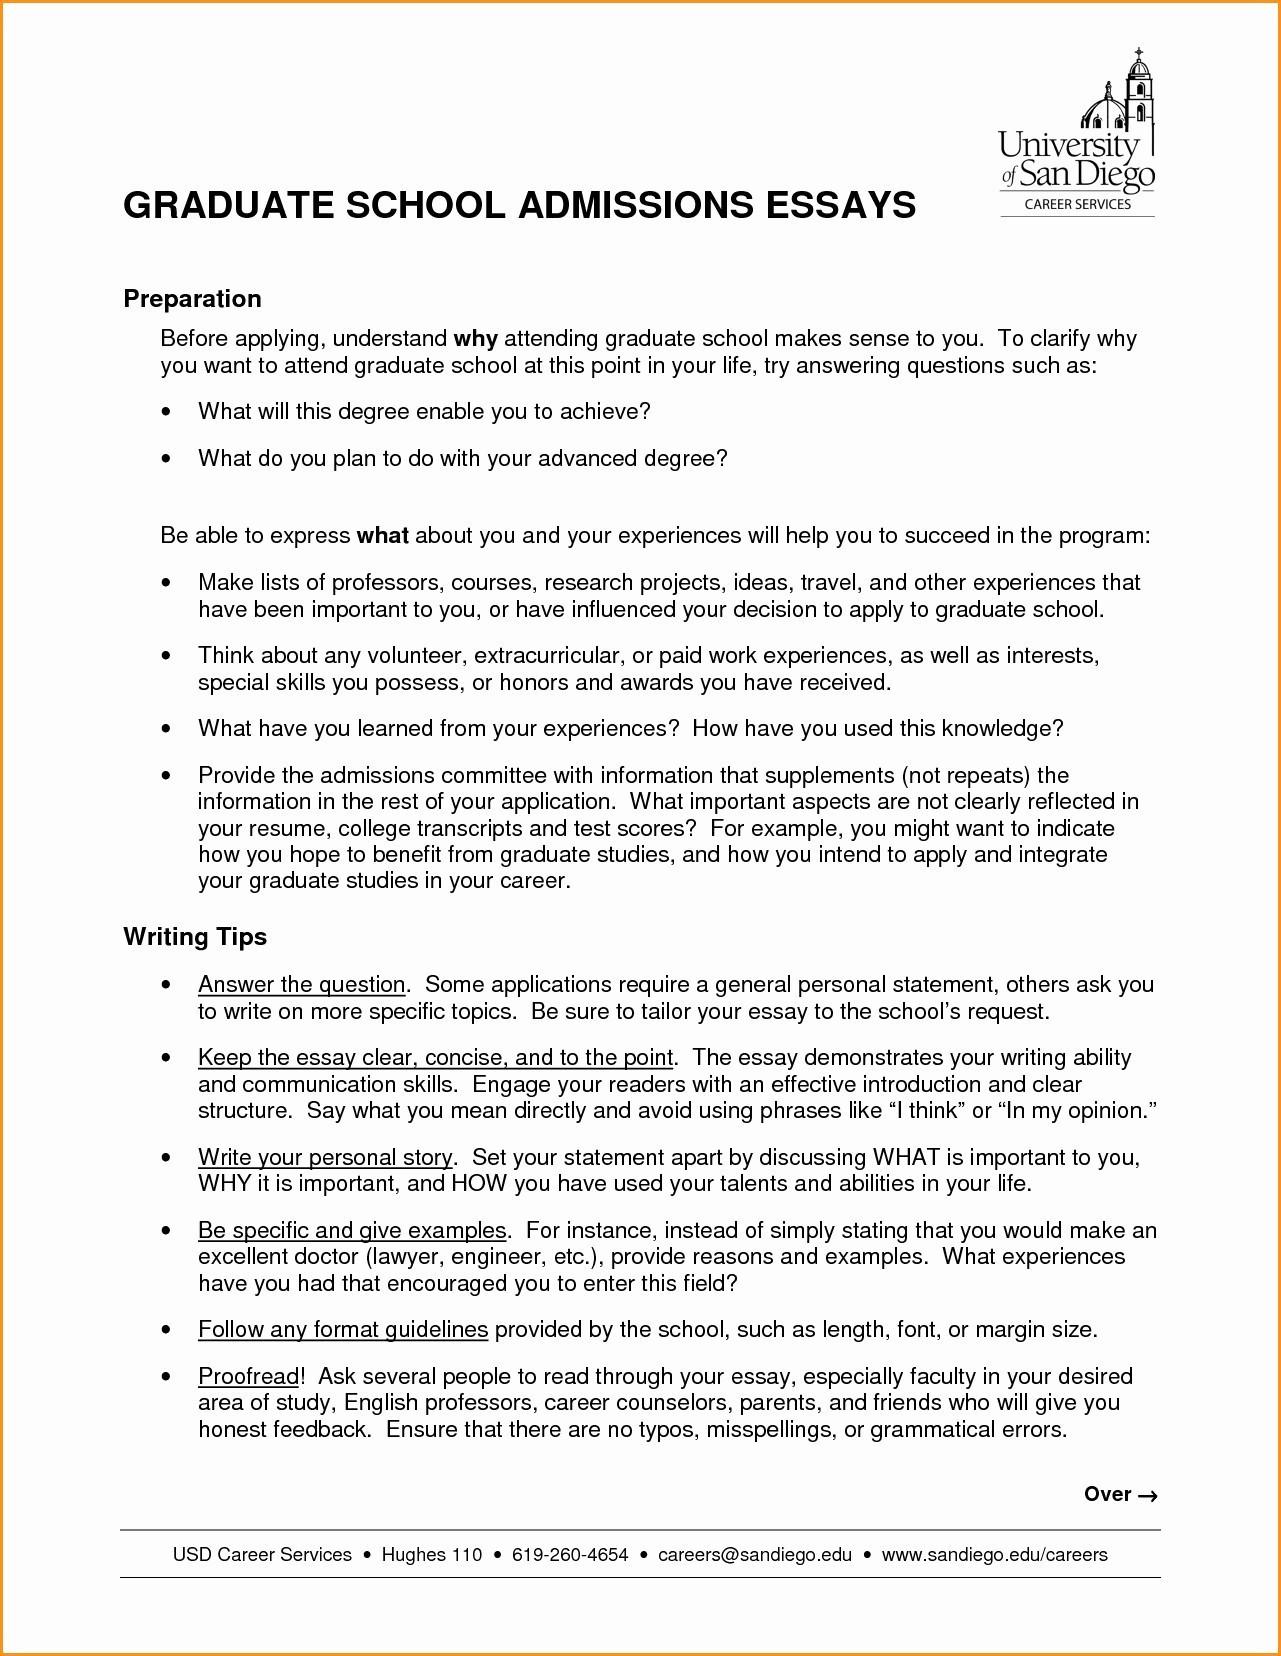 Resume Template for Letter Of Recommendation - Literarywondrous Grad School Re Mendation Letter Sample